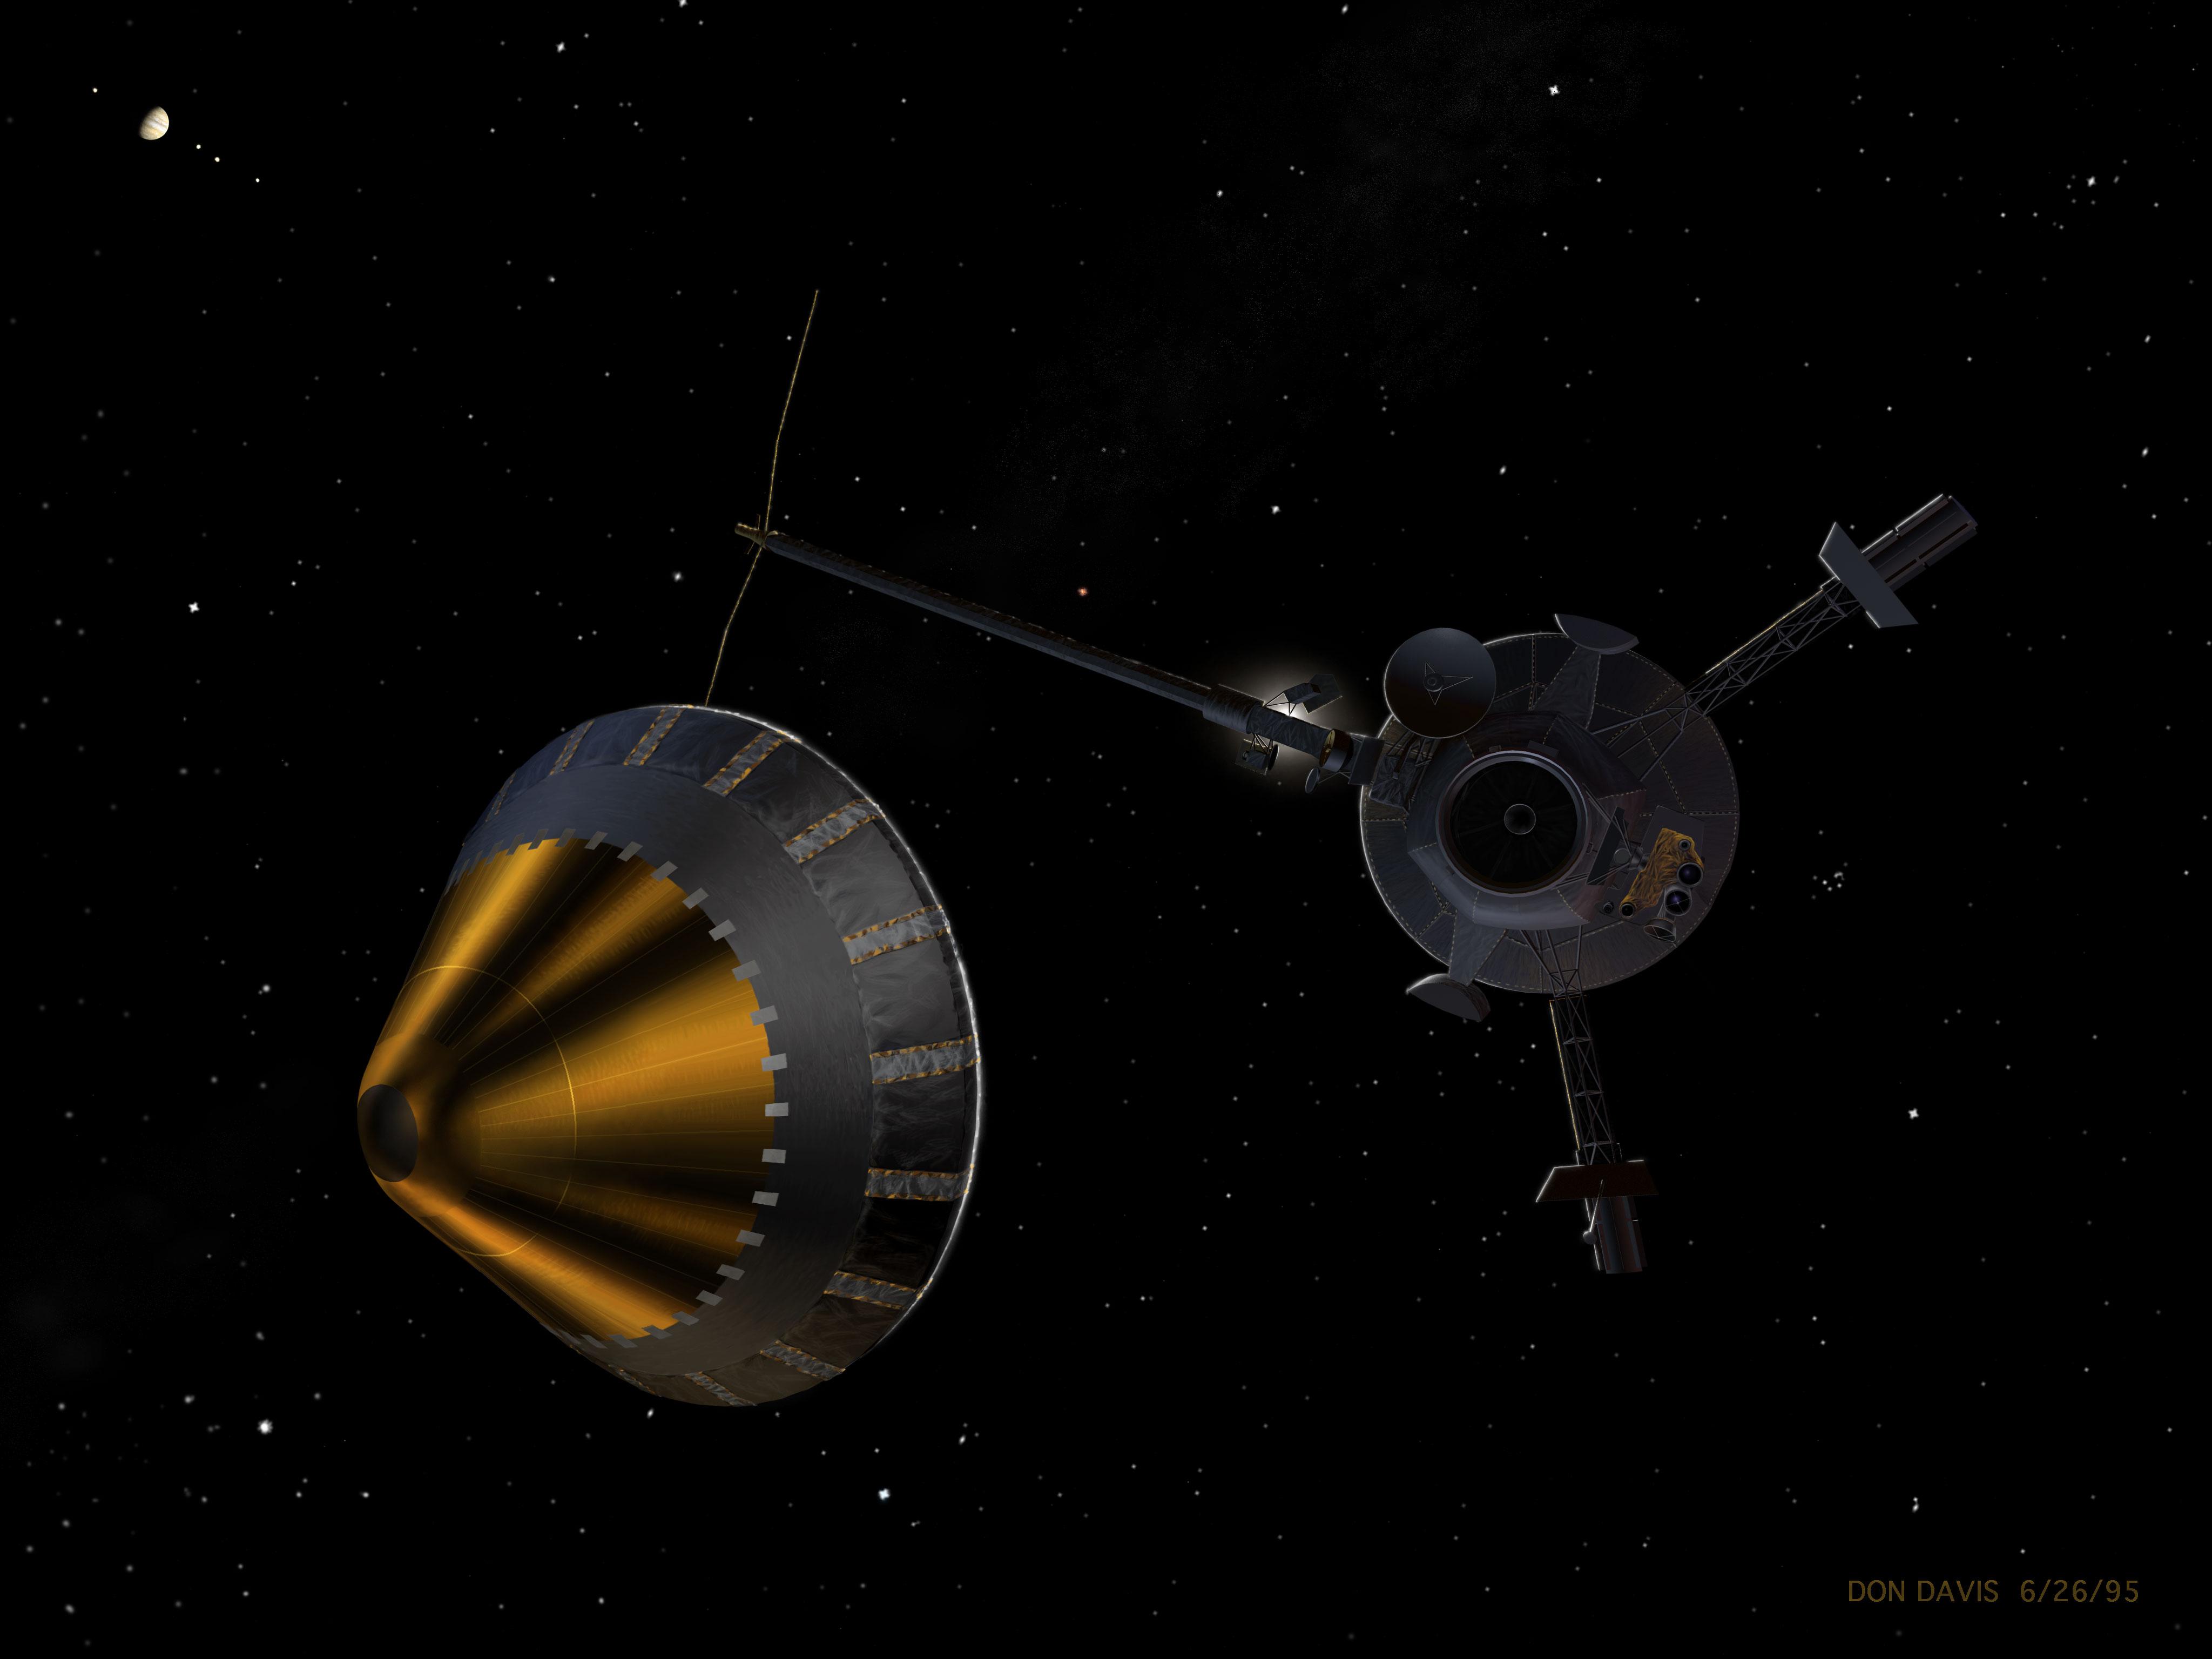 galileo space probe pics - HD4096×3072